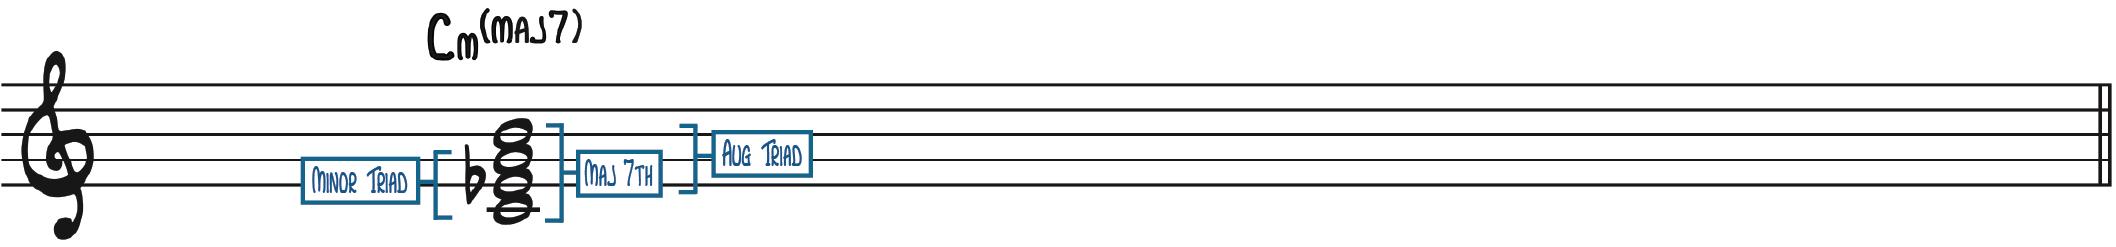 minor major seventh chord min(maj7) m(maj7) harmonic melodic